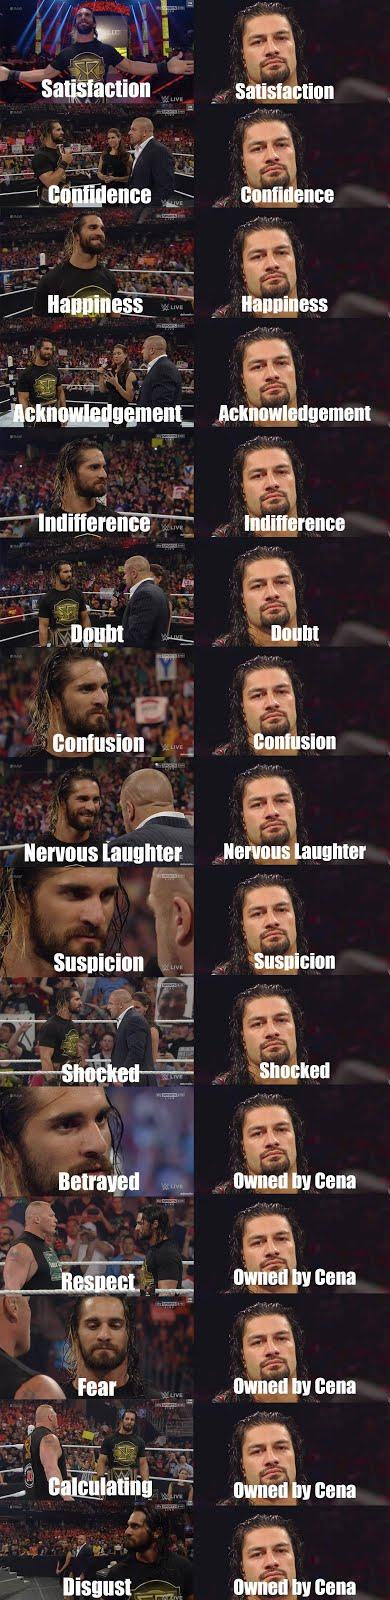 Roman Reigns vs Seth Rollins charisma